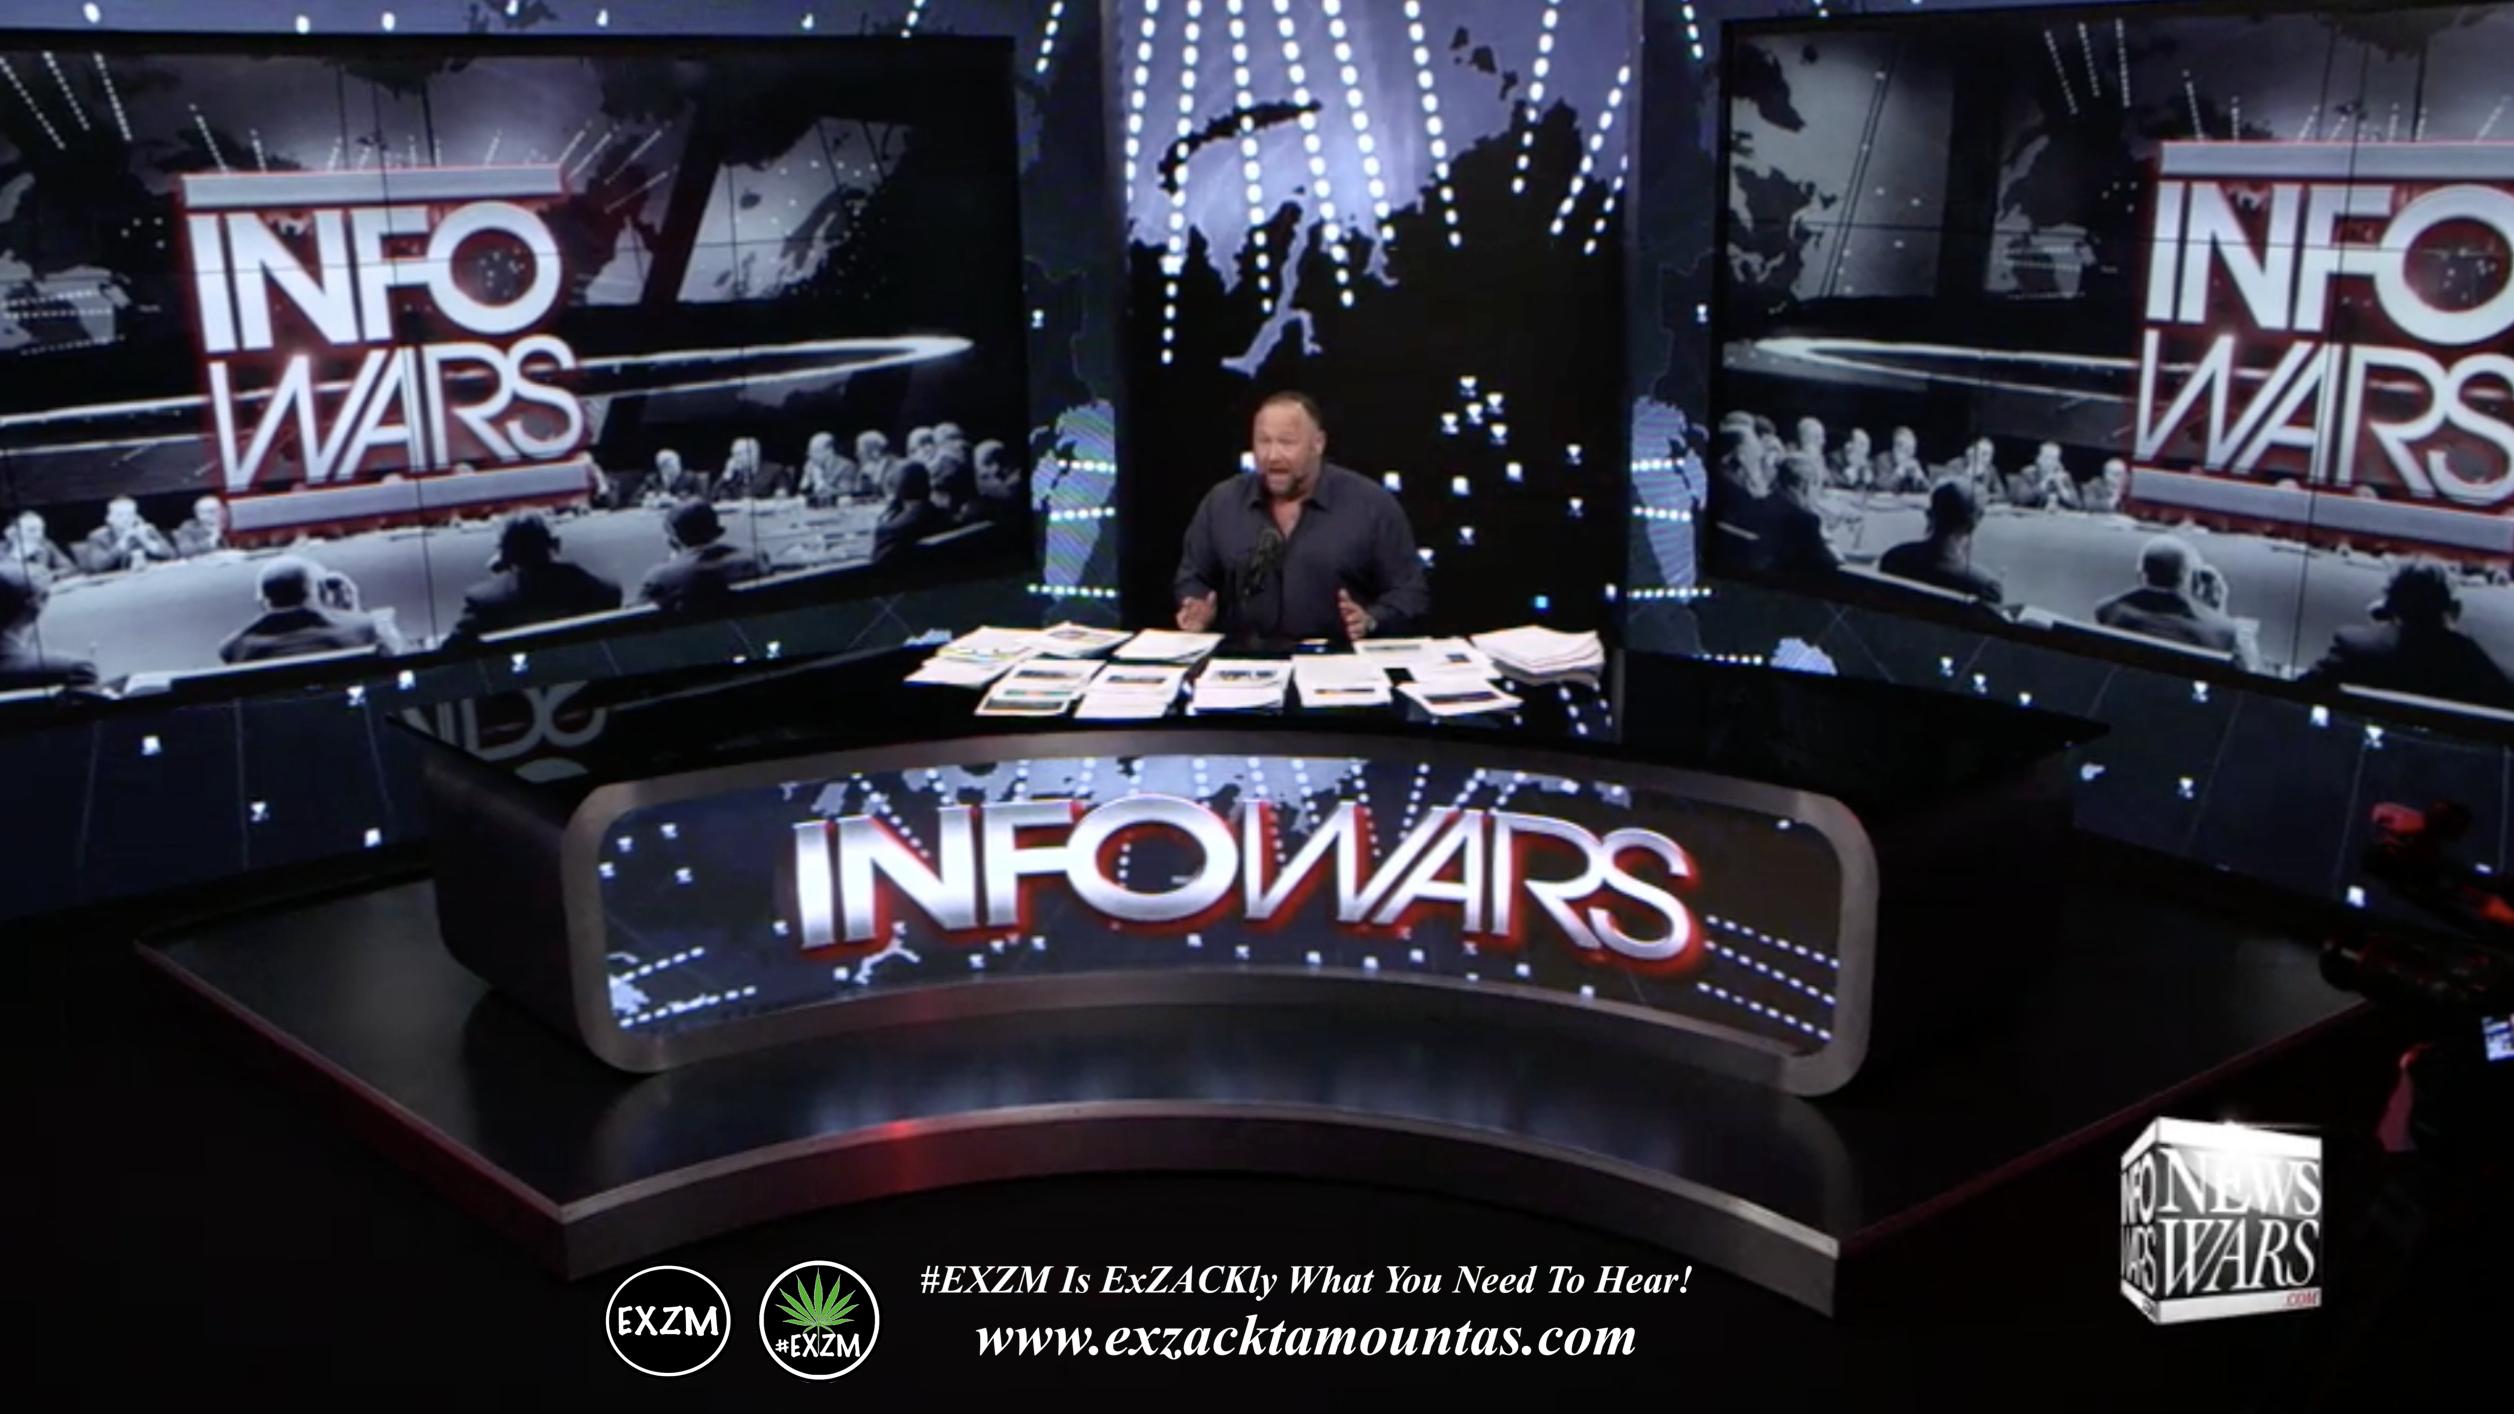 Alex Jones Live Infowars Studio EXZM Zack Mount March 4th 2021 copy